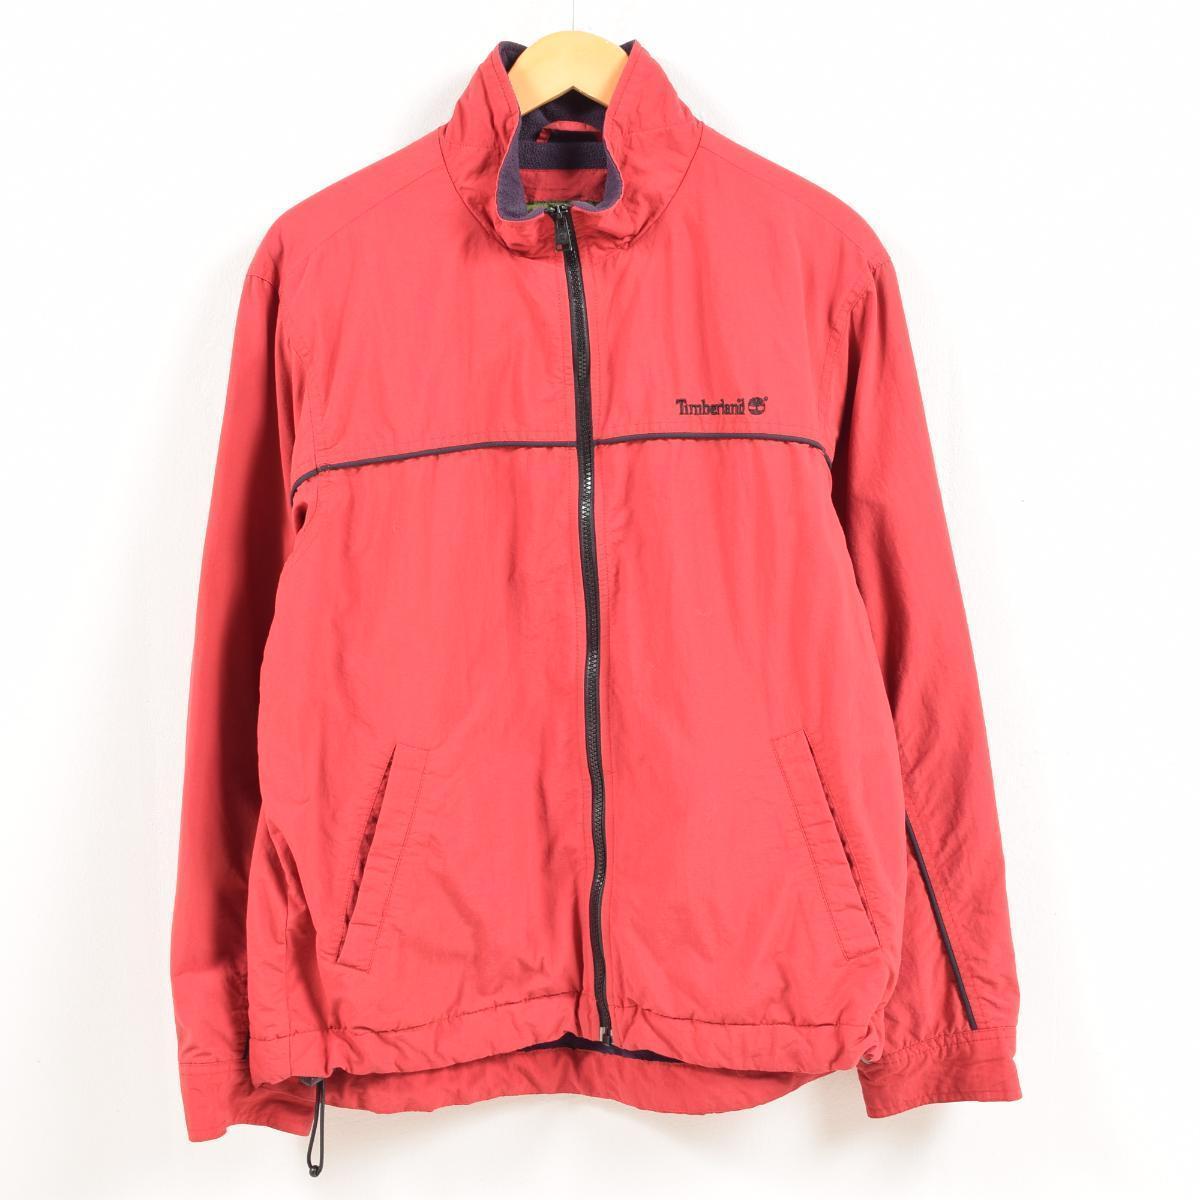 00de23036c8 90s Timberland Timberland WEATHERGEAR fleece liner mountain jacket men S  /wat2468 ...